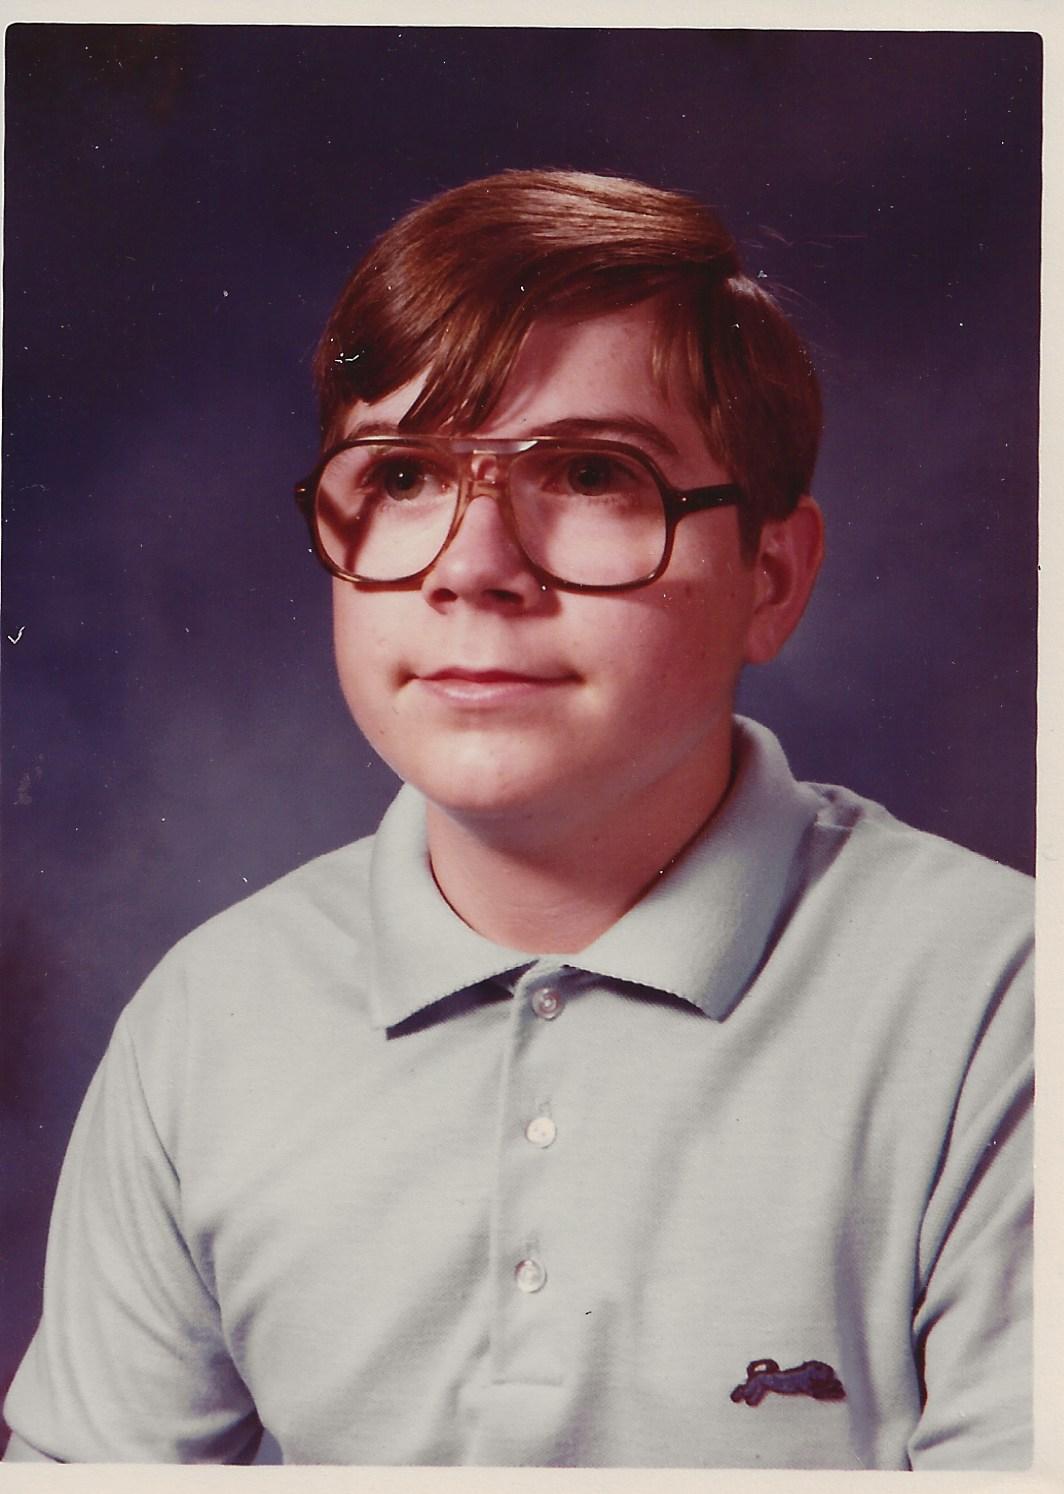 Joe school pic 1979